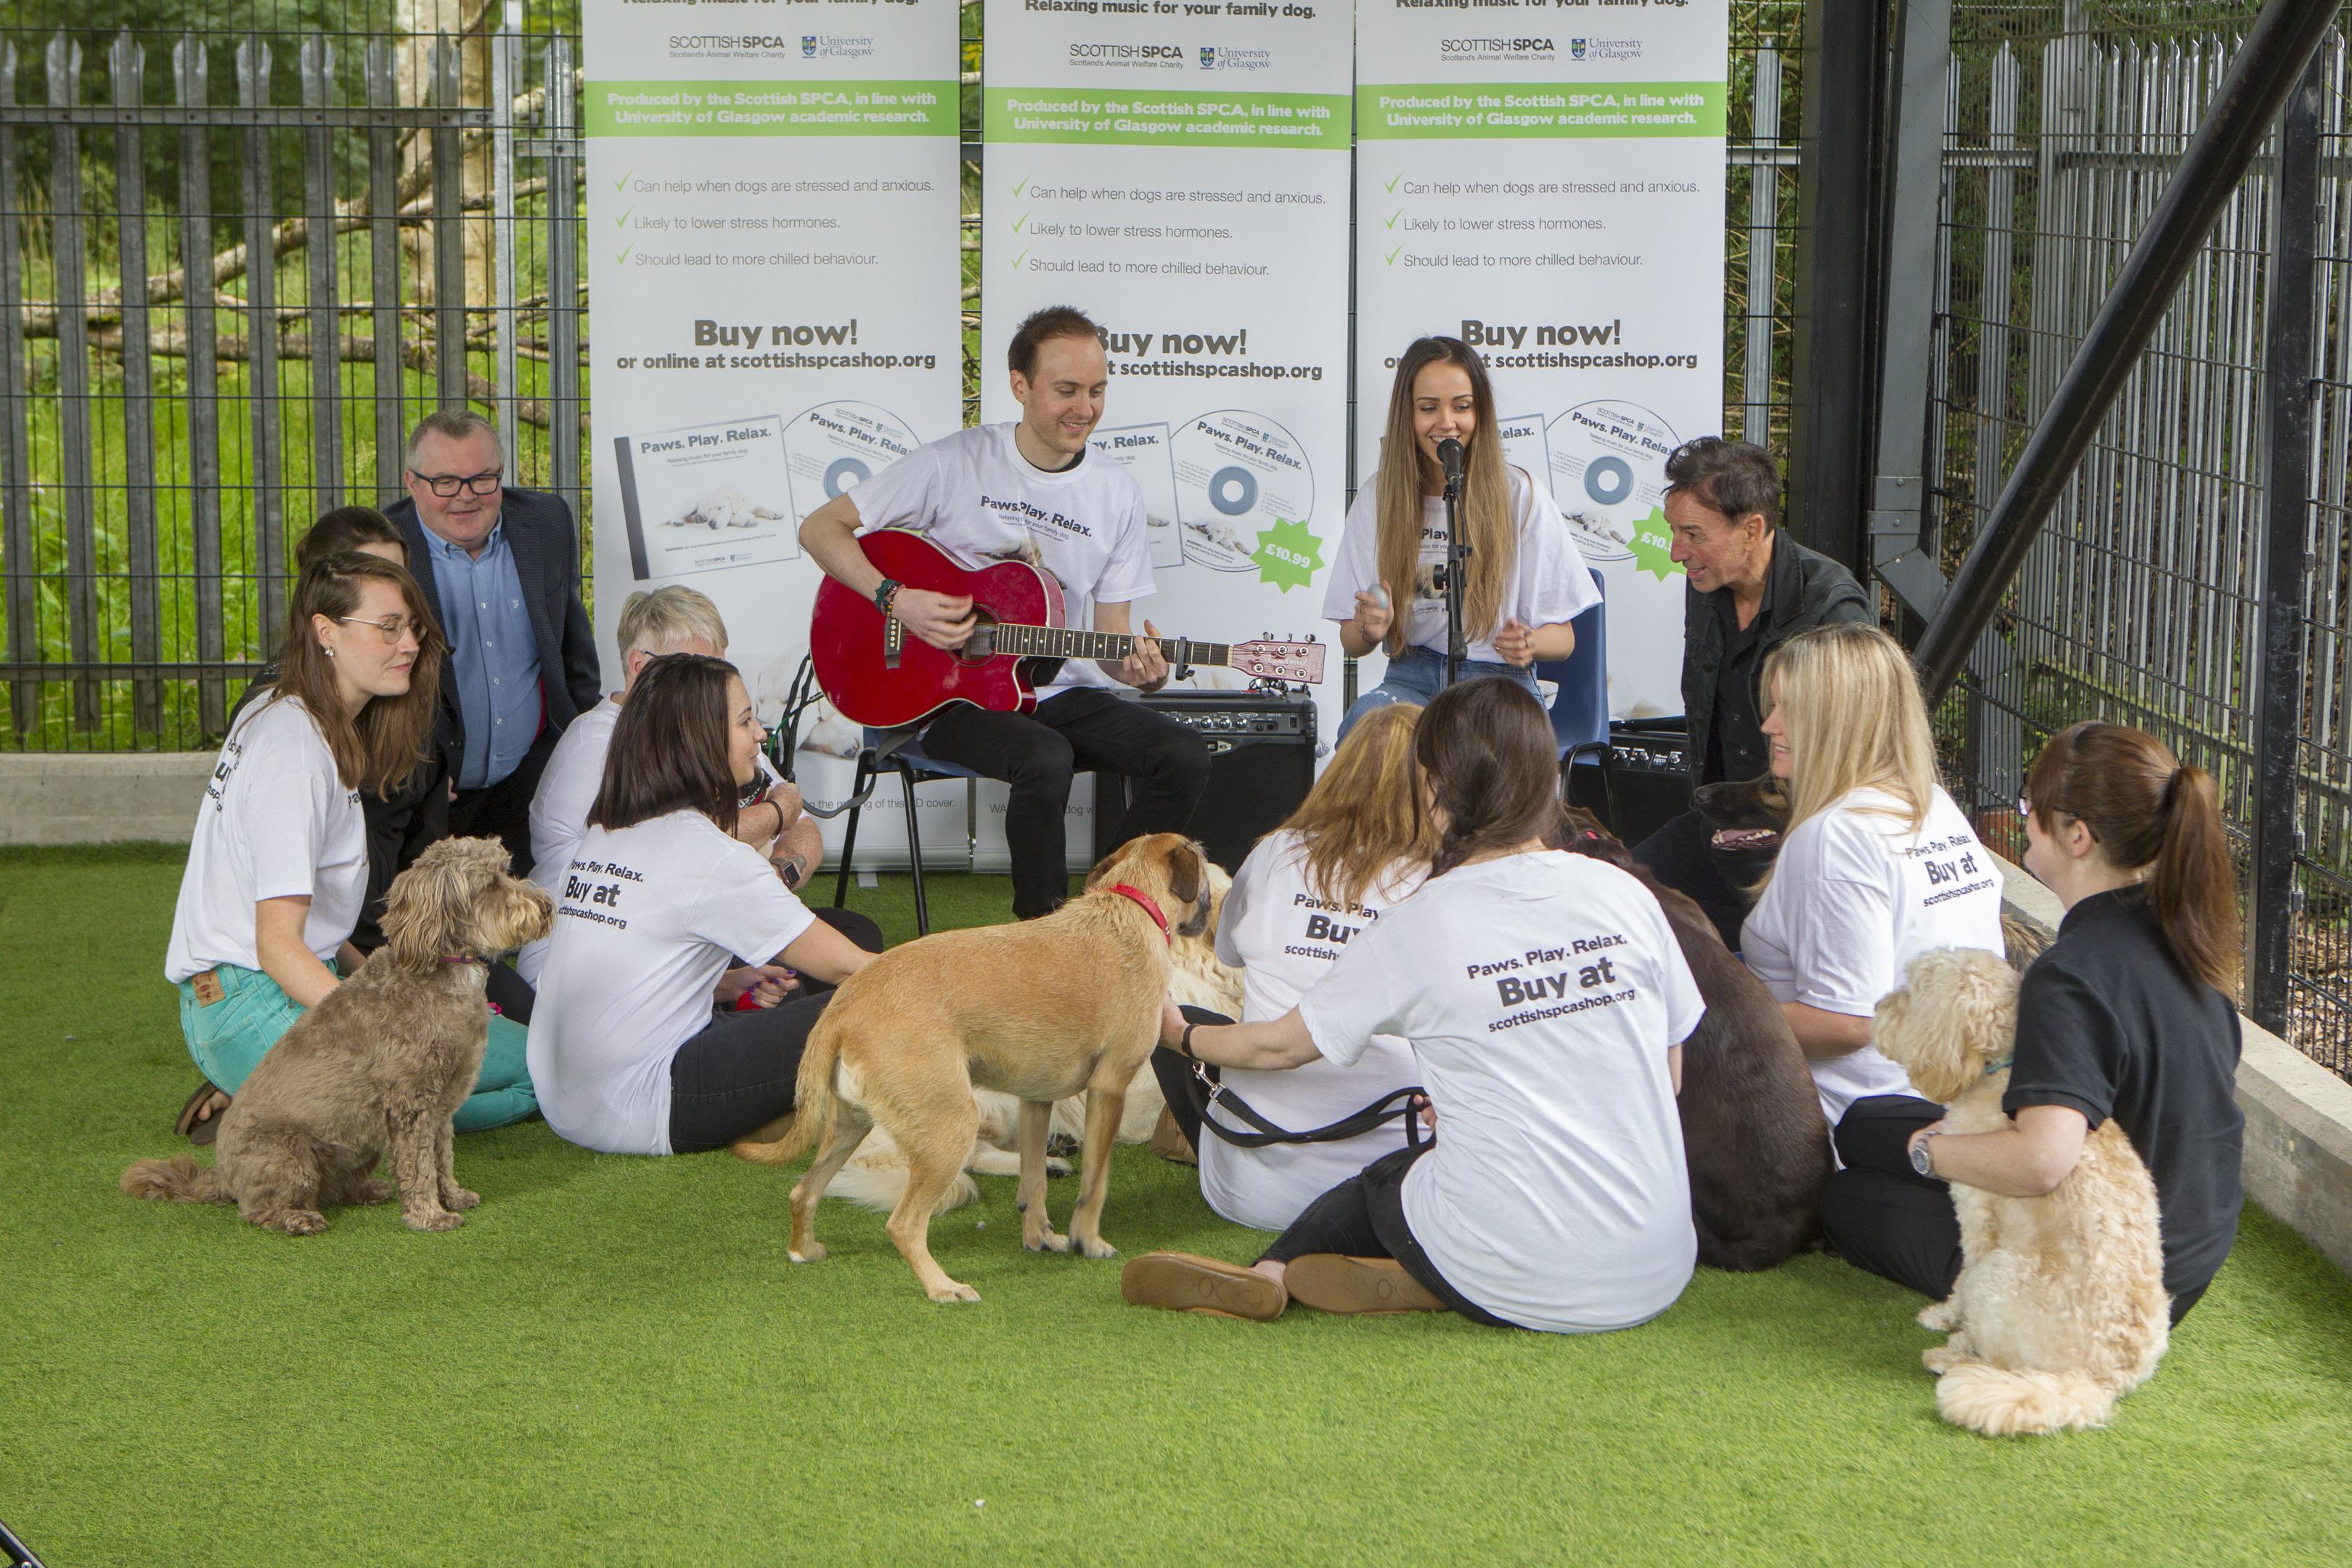 Music for dogs: Scottish SPCA release doggy inspired music album